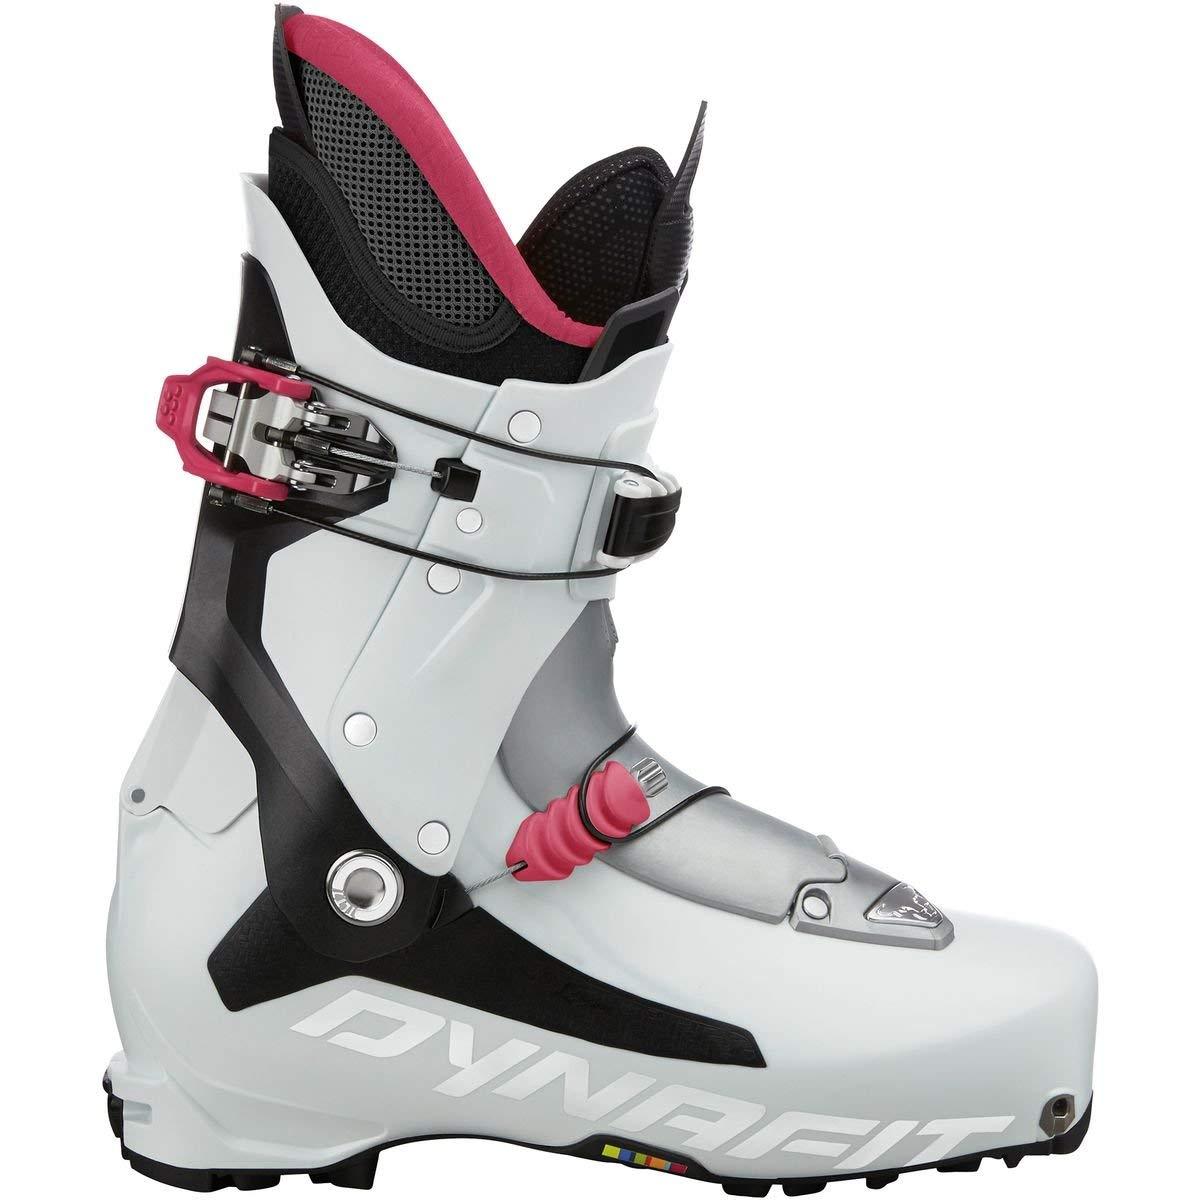 Dynafit TLT7 Expendition CR Ski Boot - Women's